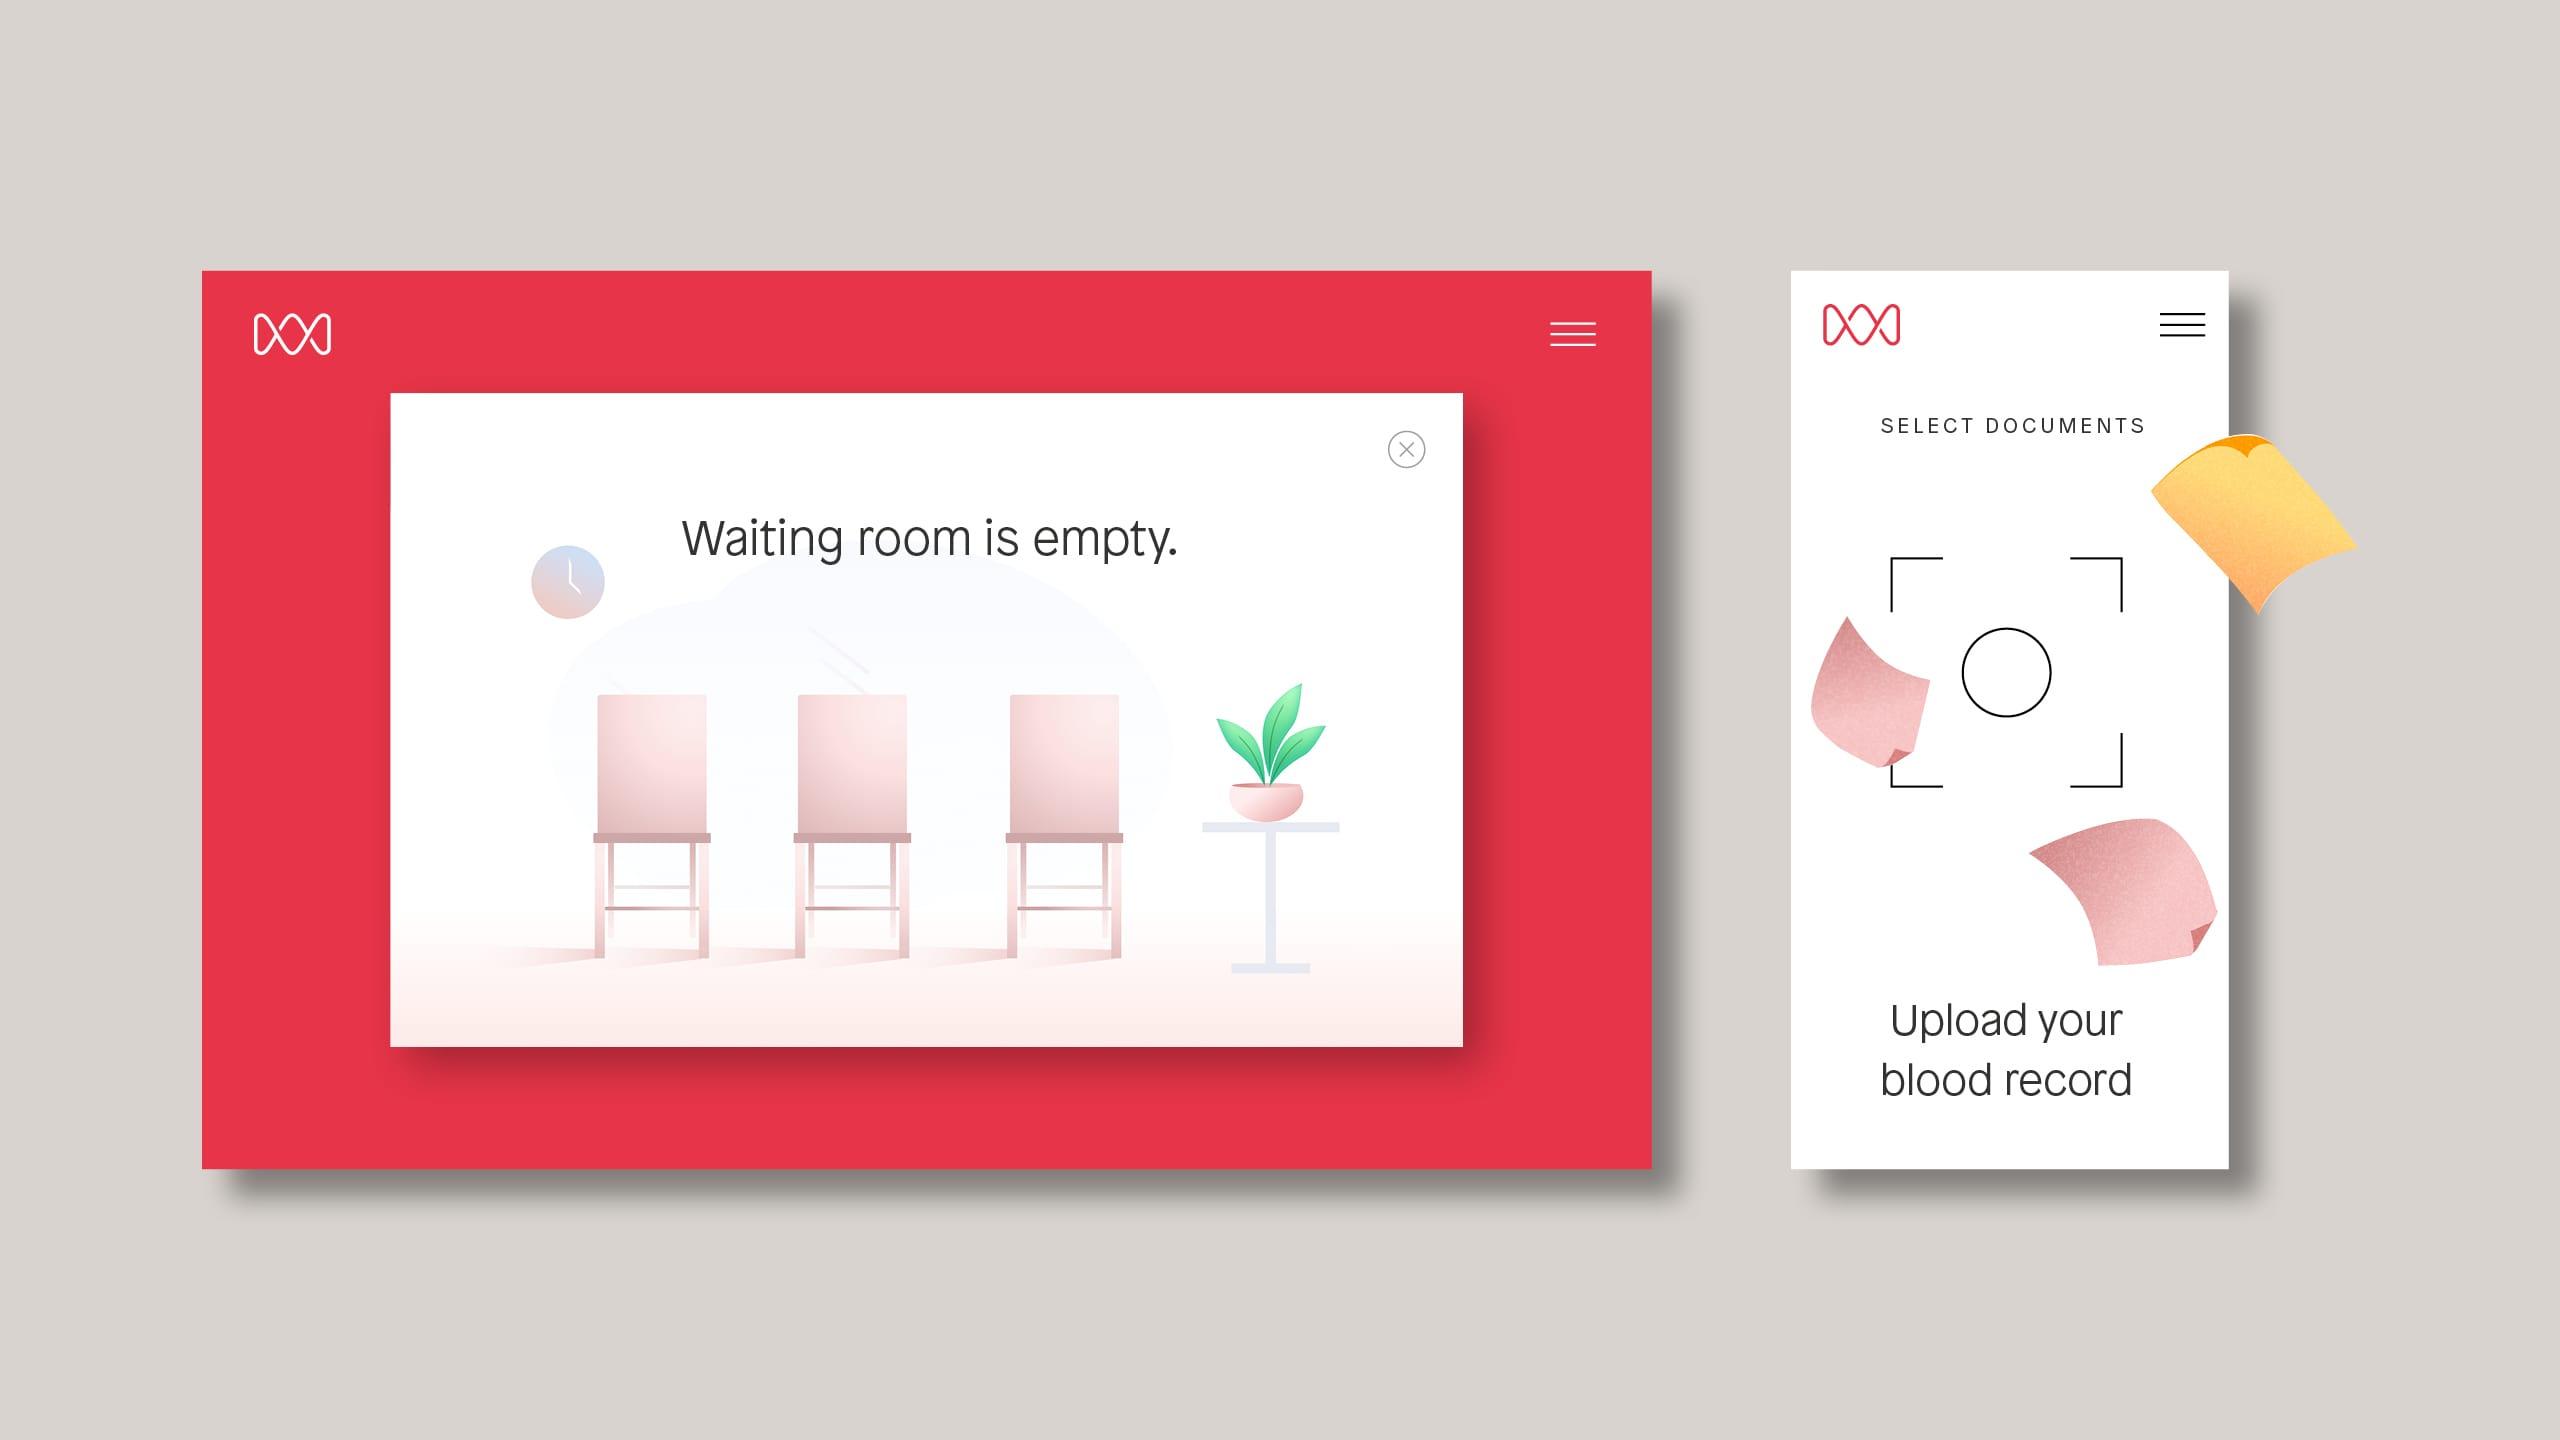 mantik-digital-branding-development-agency-creative-app-ui-web-branding-215-min